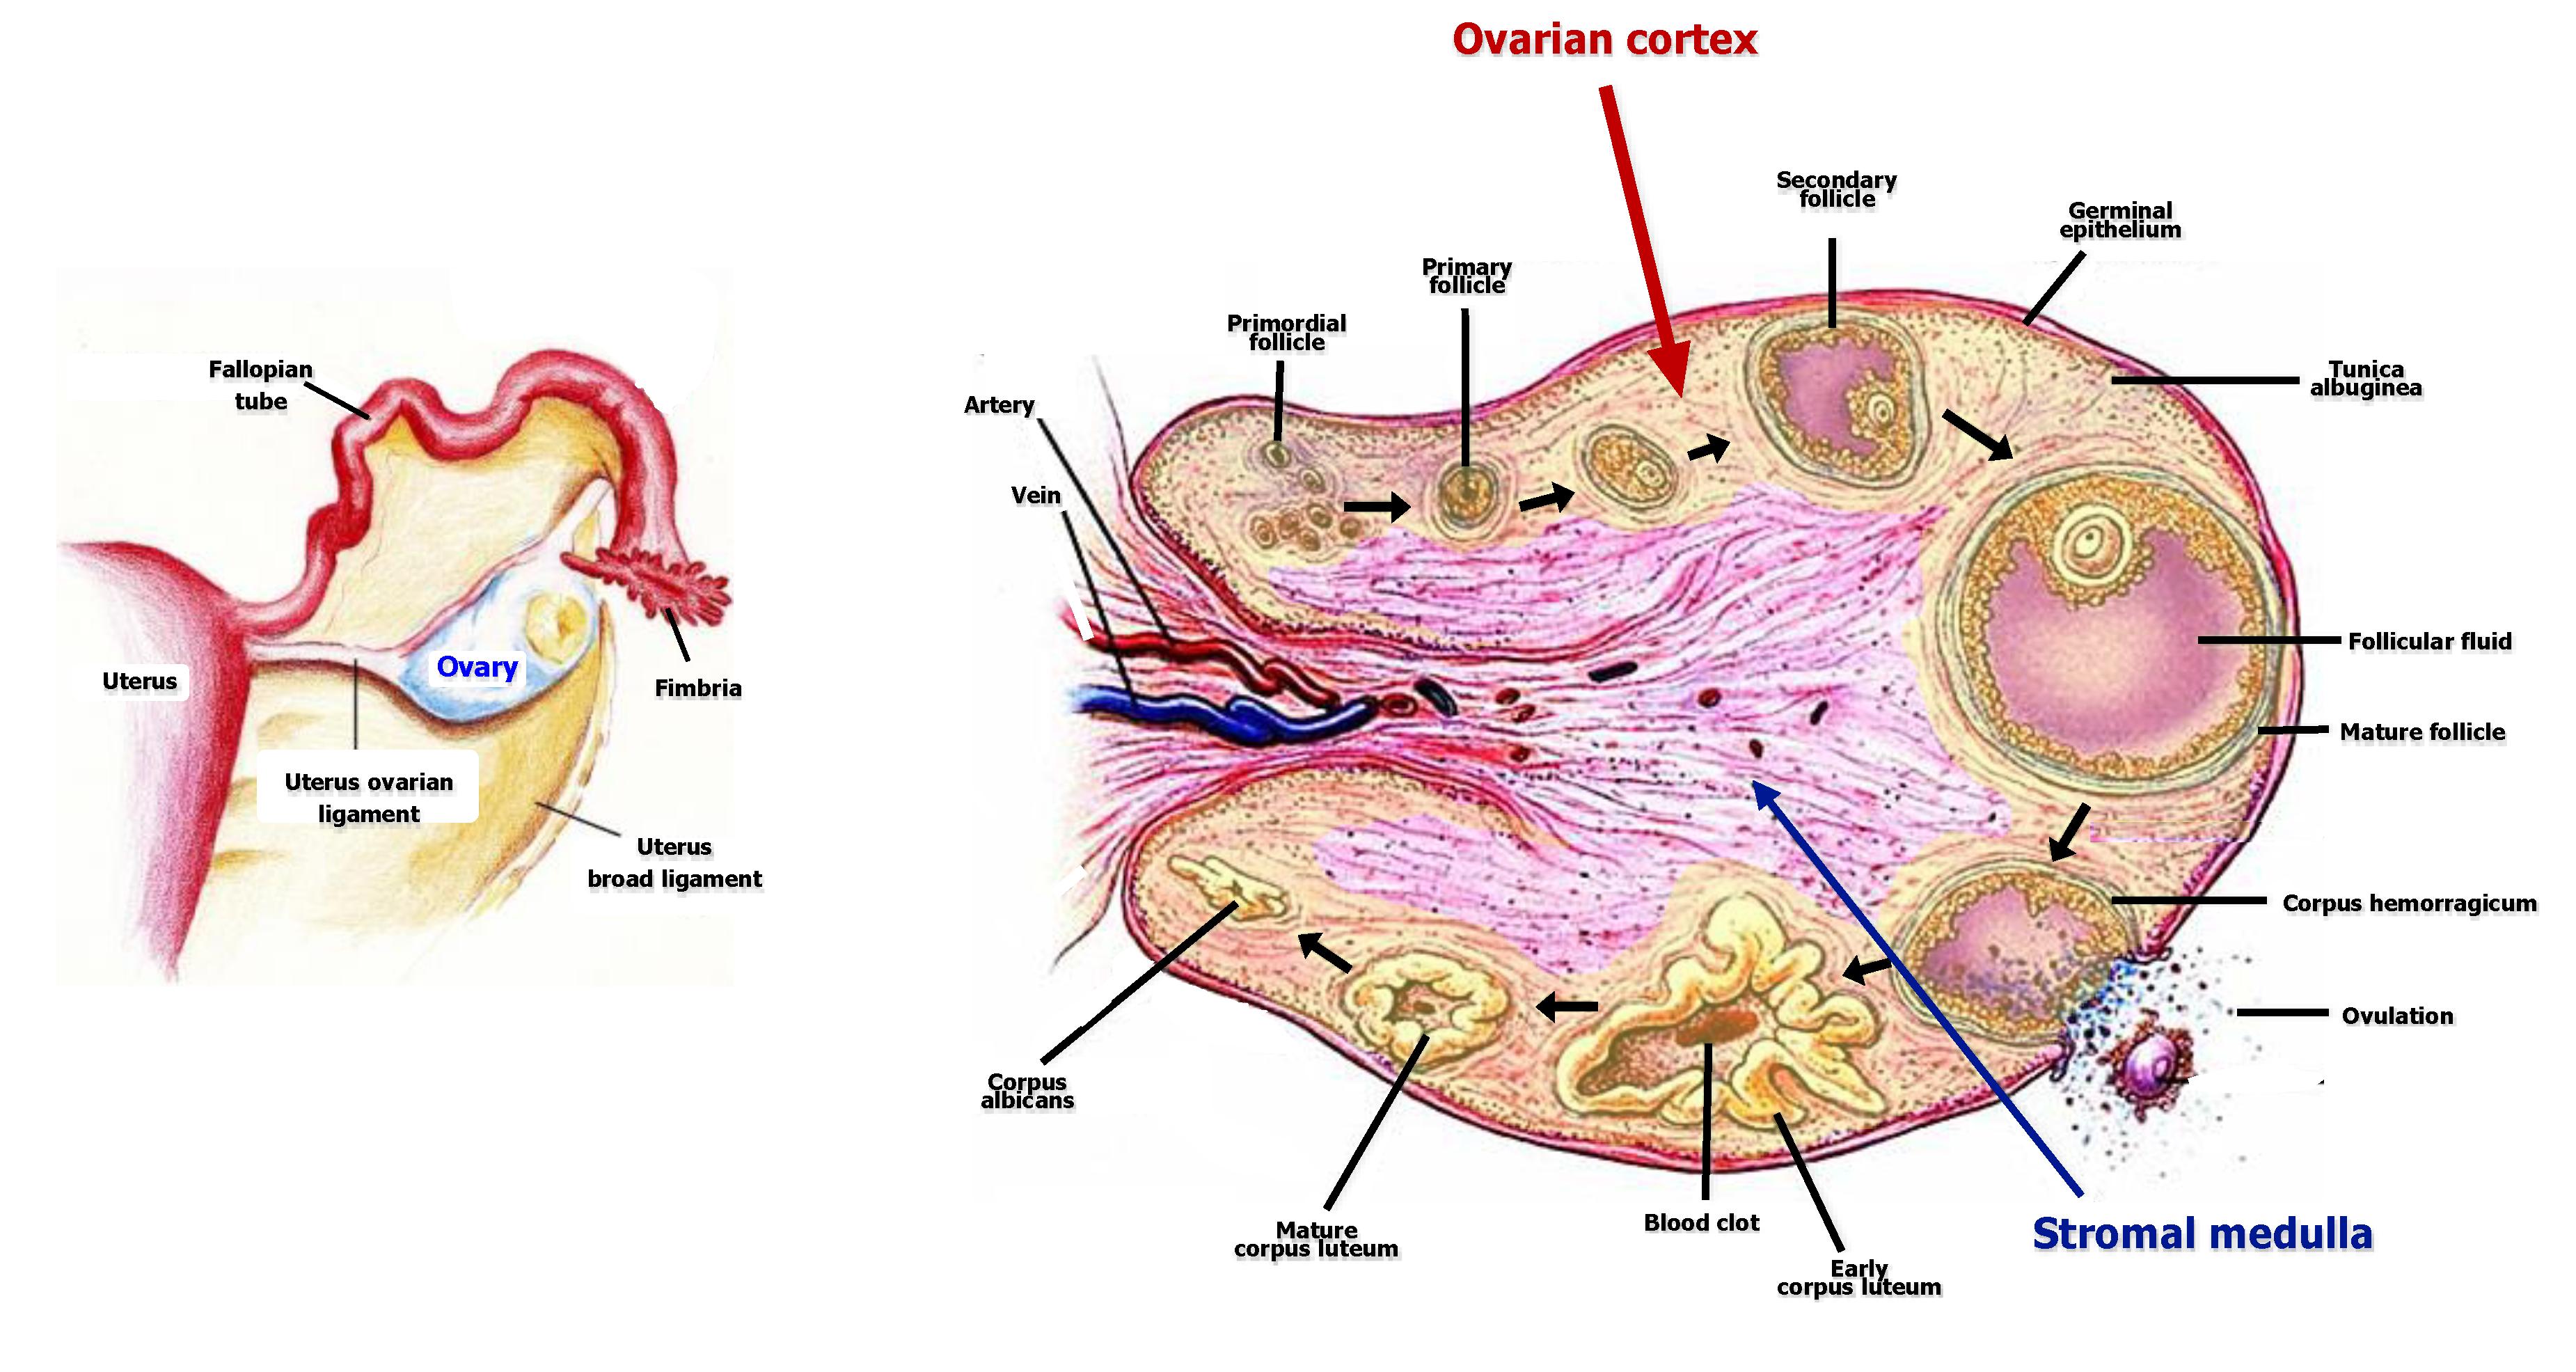 schema ciclo ovarico ovary uterus fallopian tubes follicle